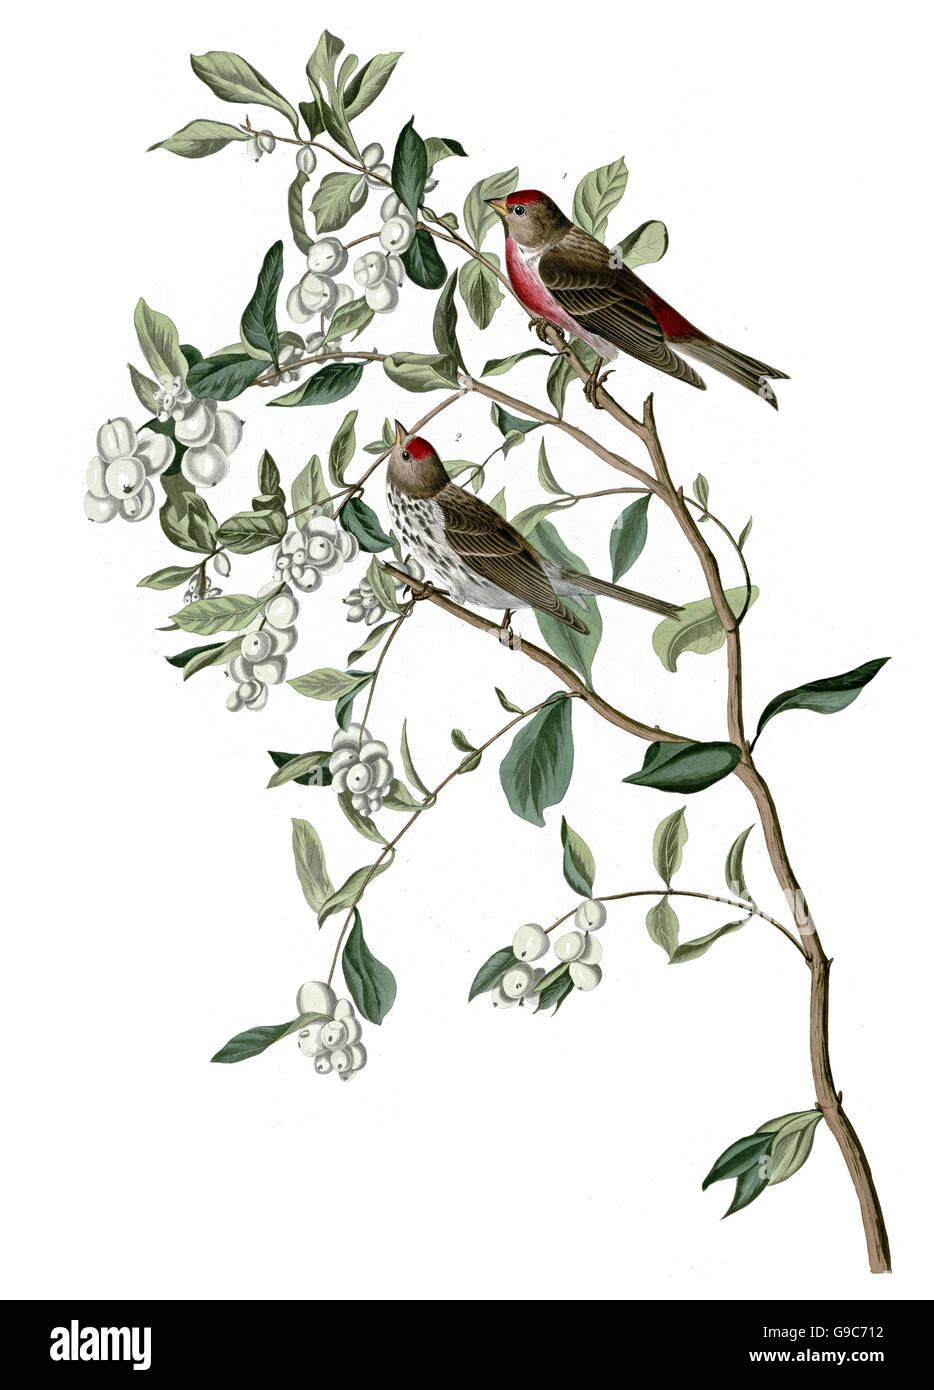 Common Redpoll, Carduelis flammea, birds, 1827 - 1838 - Stock Image